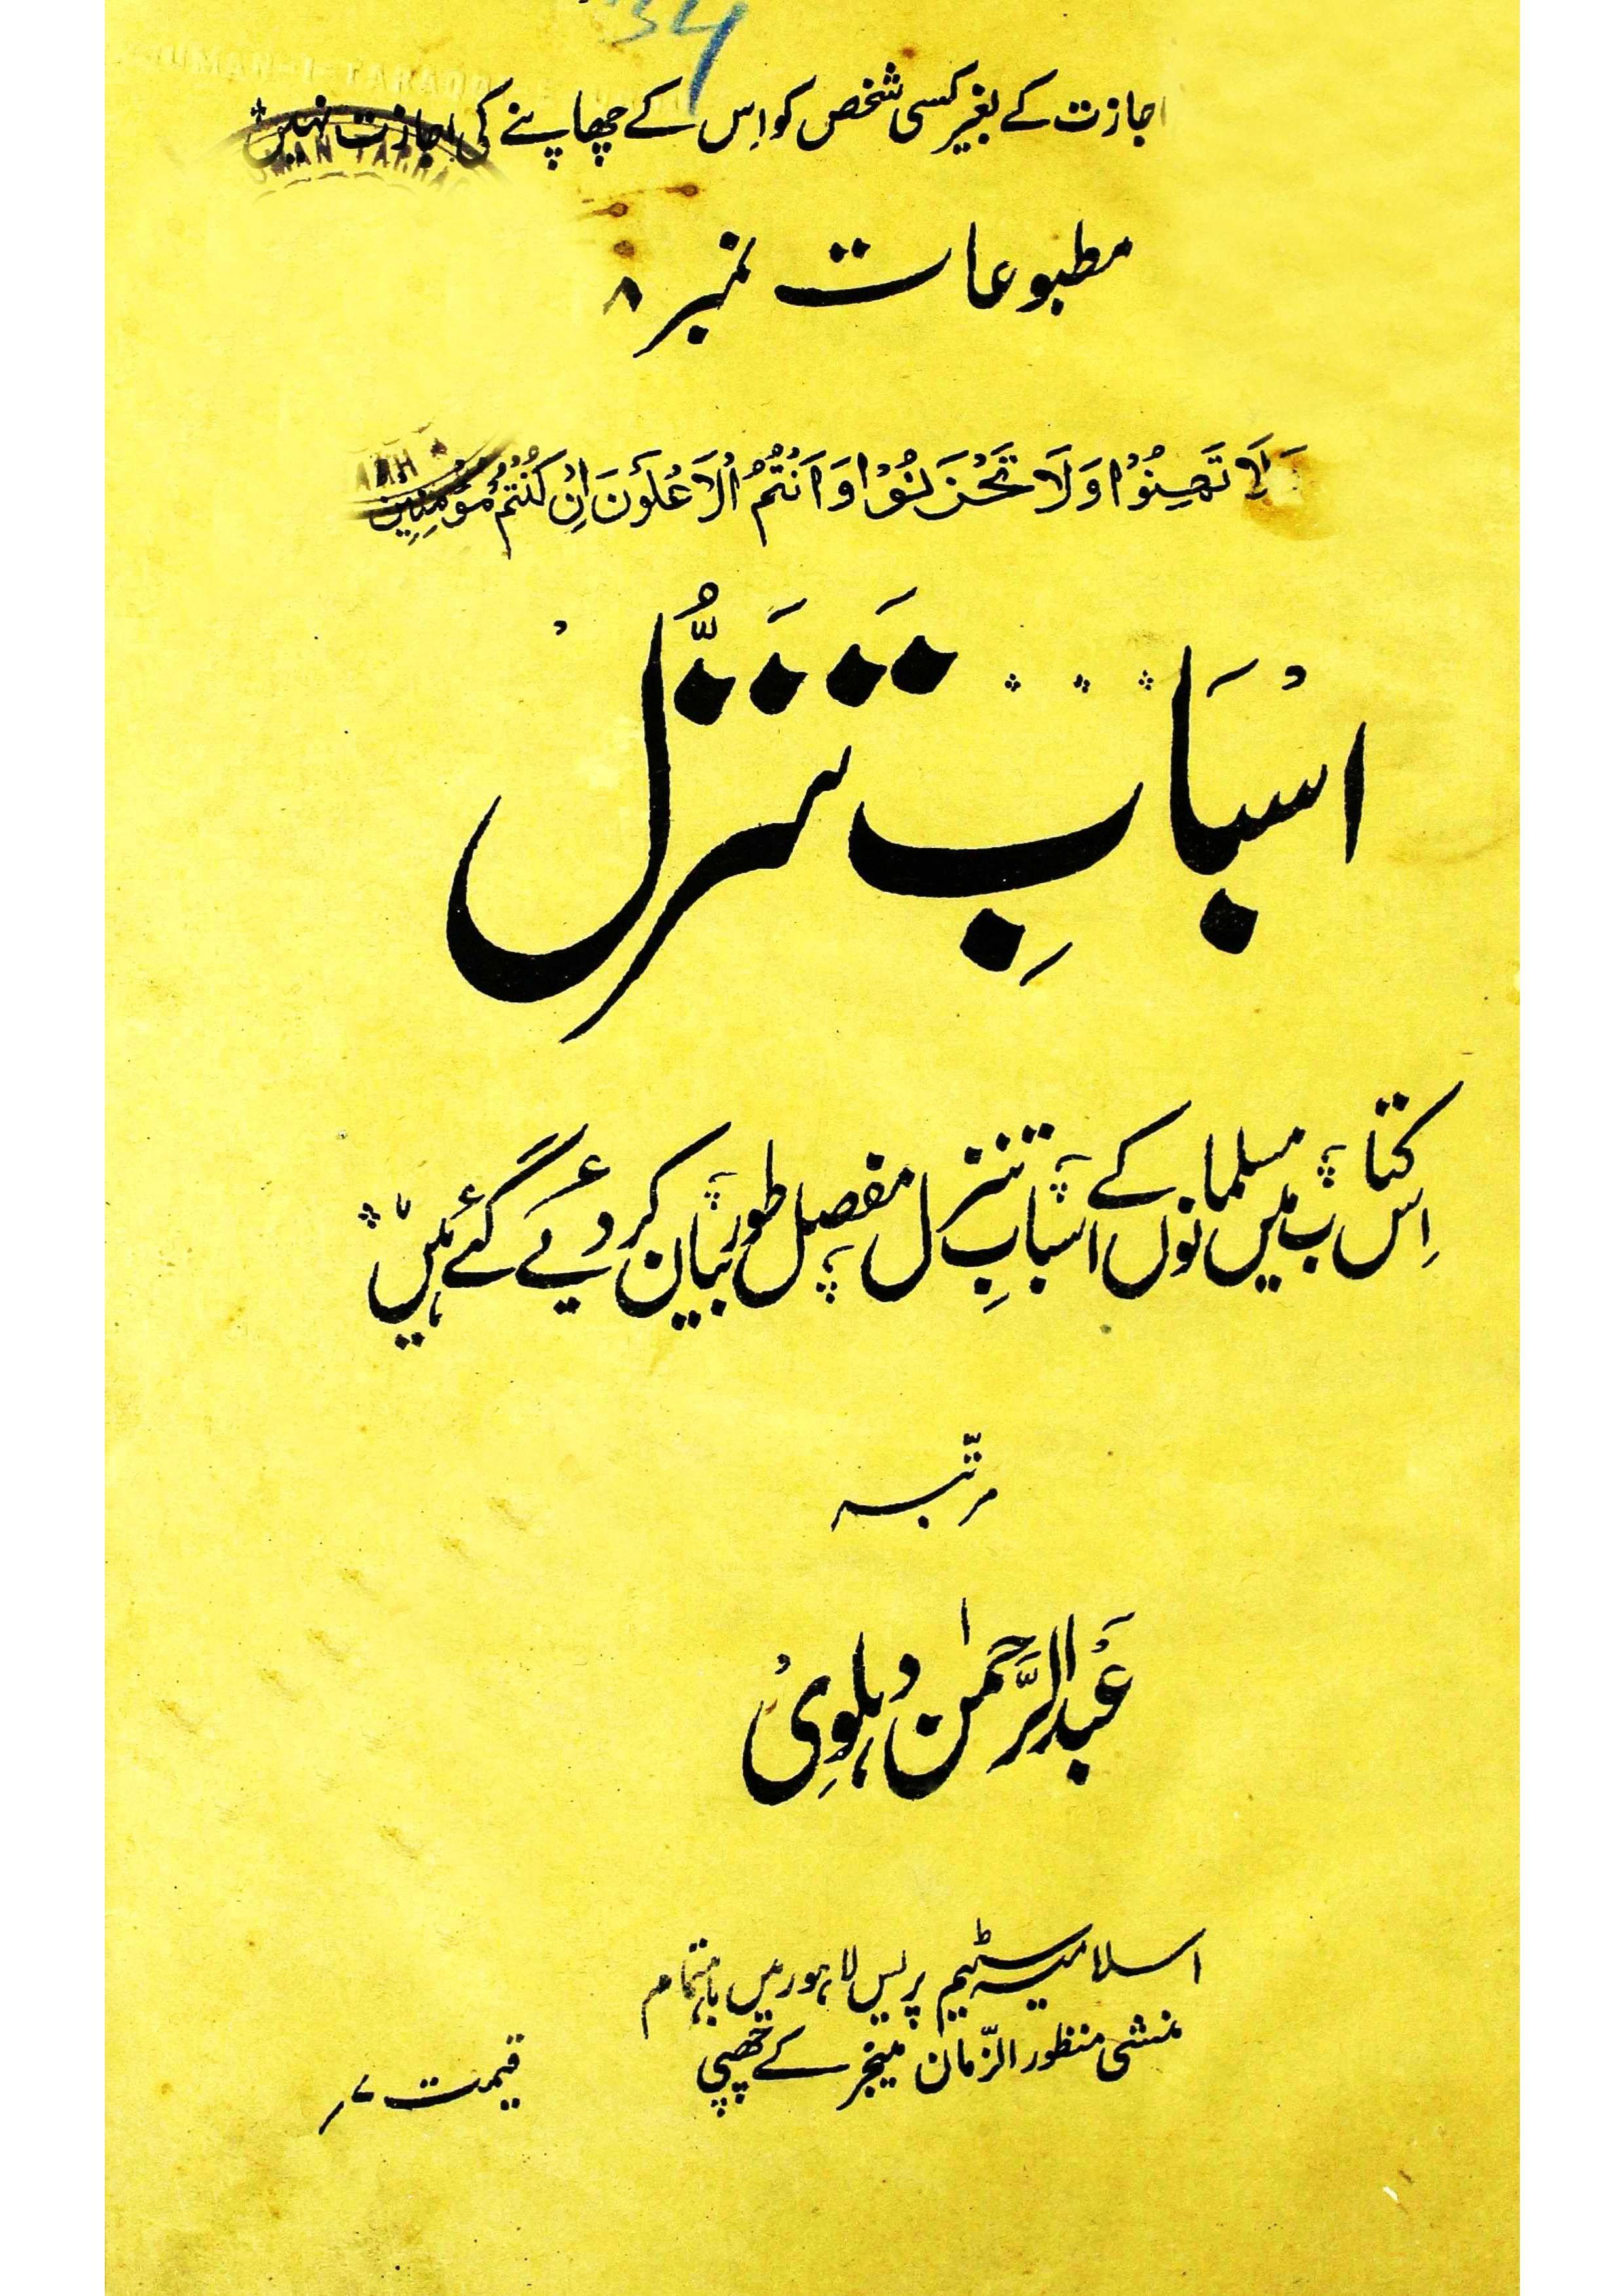 Asbaab-e-Tanazzul